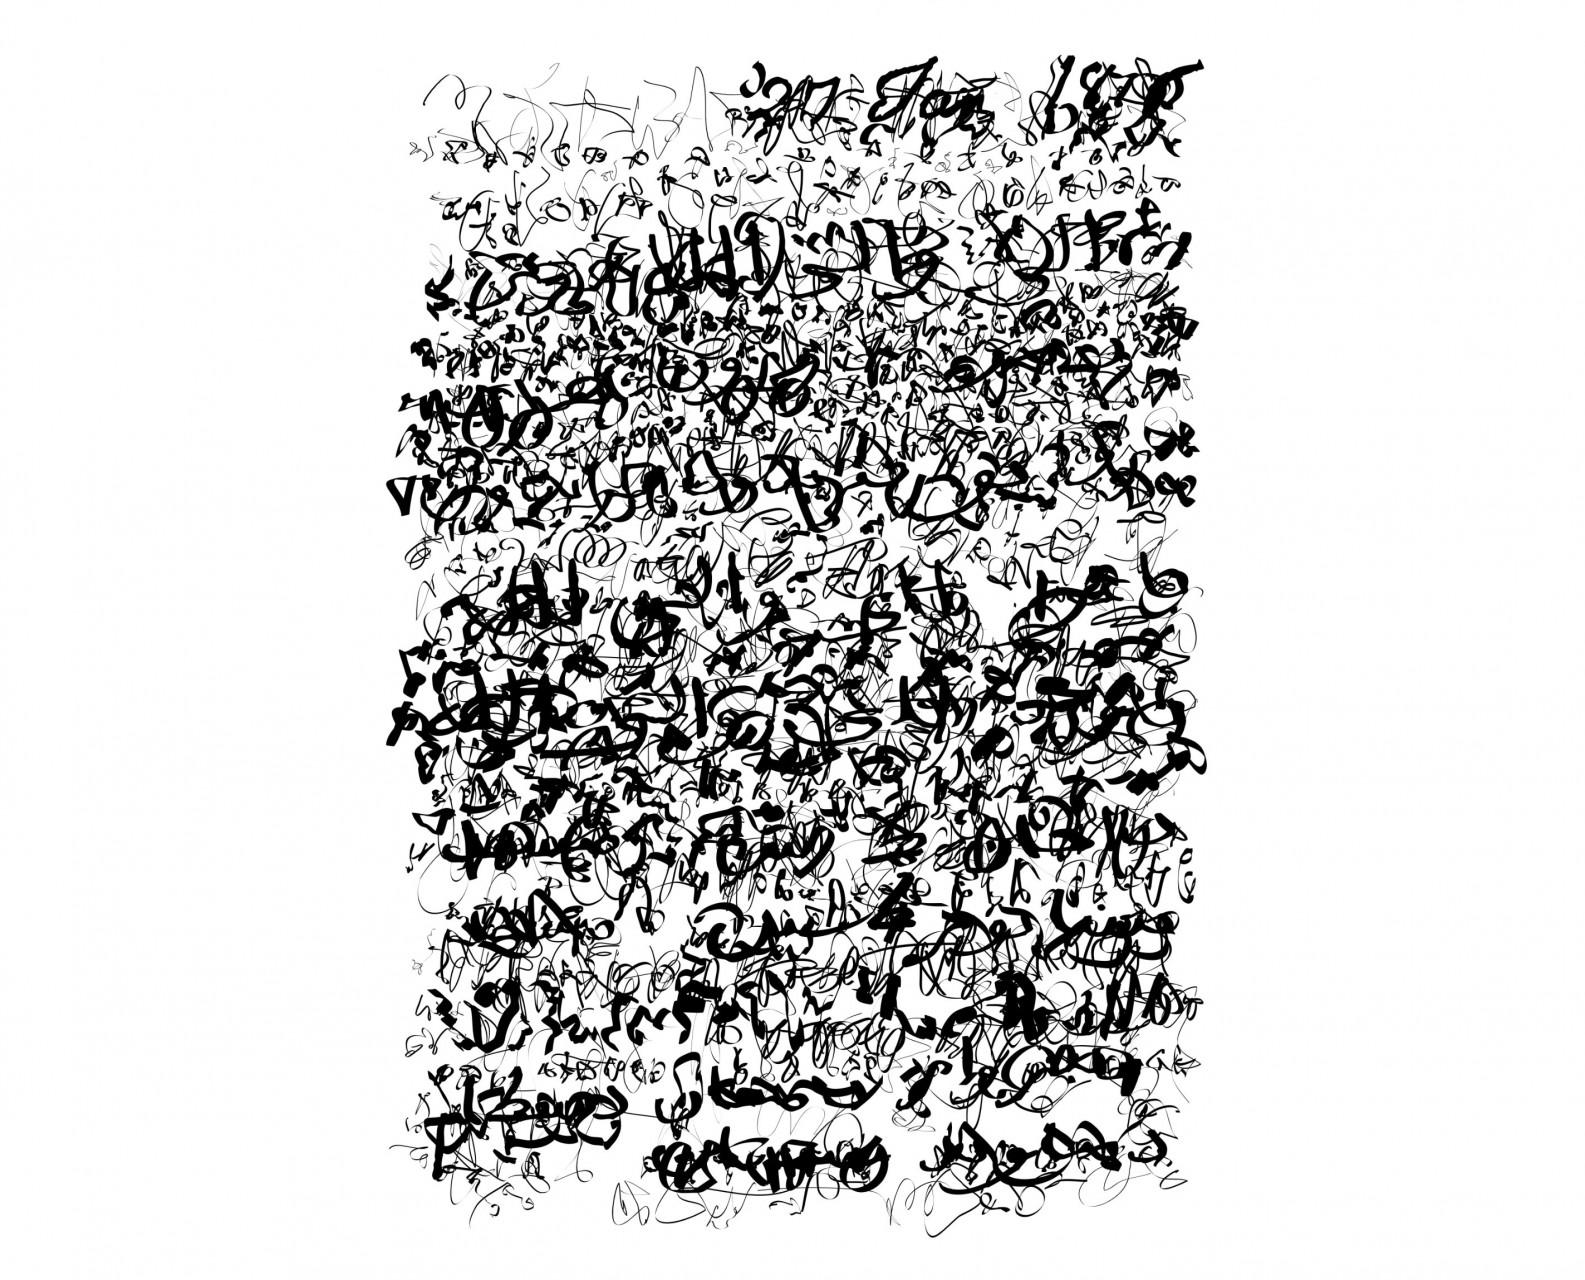 Palimpsest 017, Eco-Solvent Tinte auf LKW-Plane, 137 x 205 cm, 2017